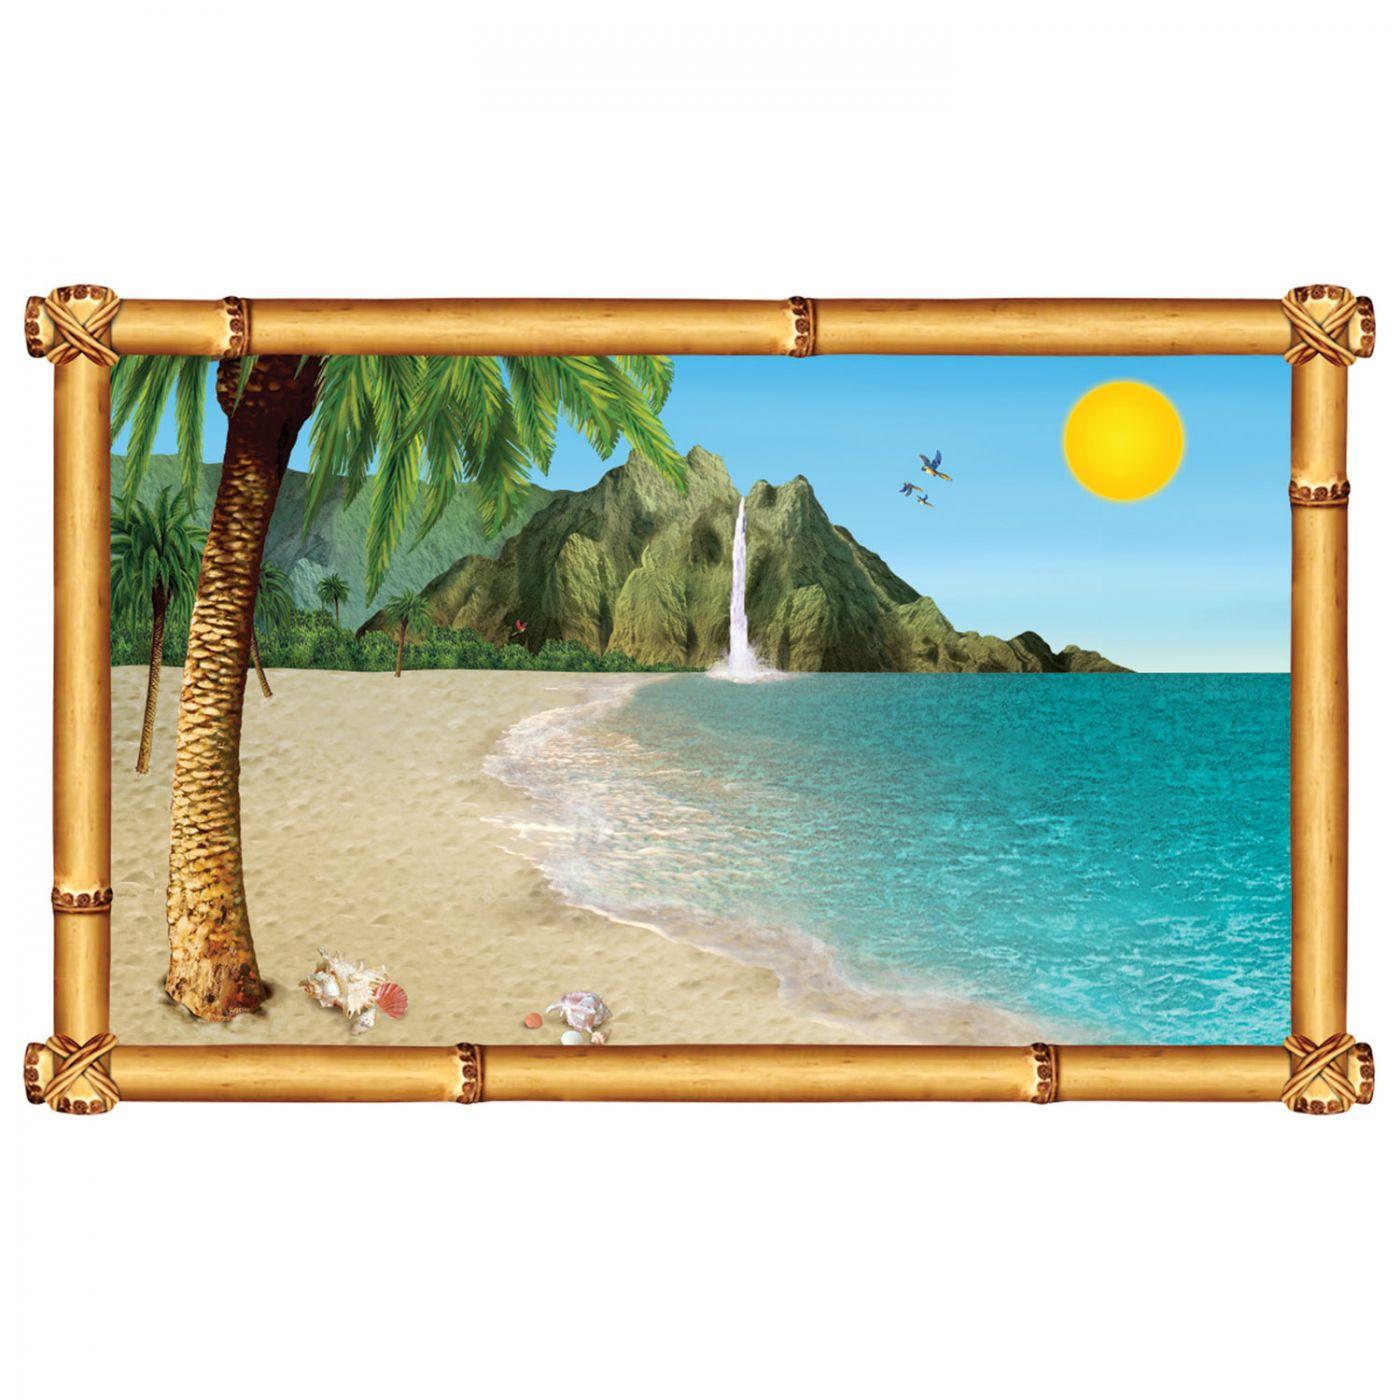 Tropical Beach Insta-View (6) image